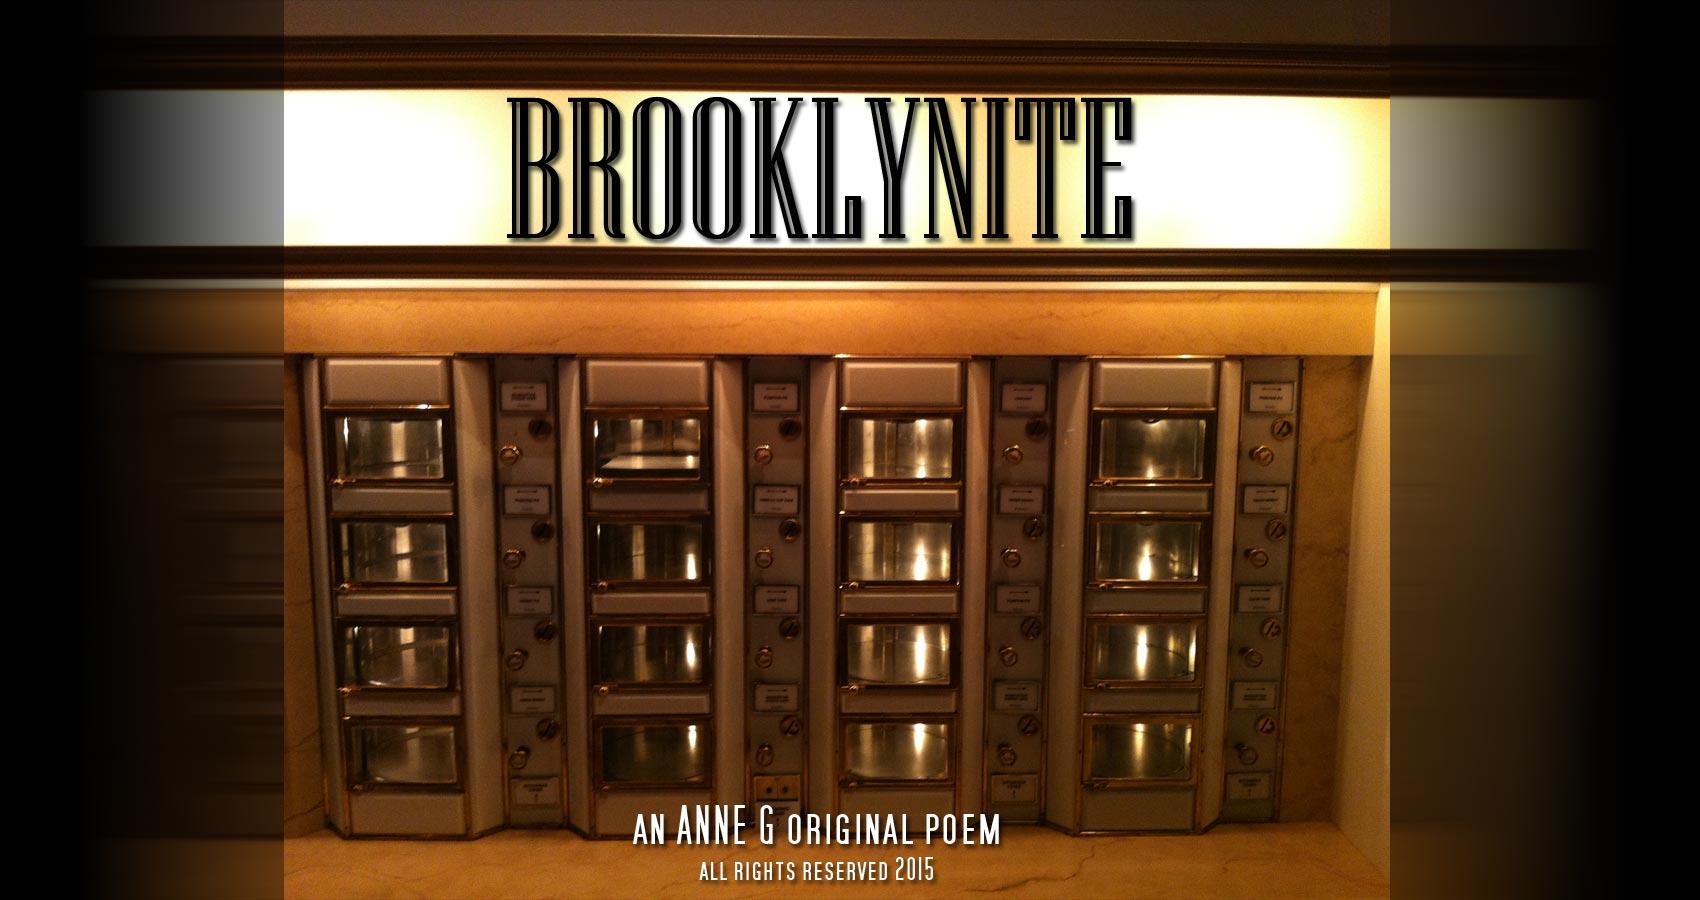 spillwords.com Brooklynite by Anne G